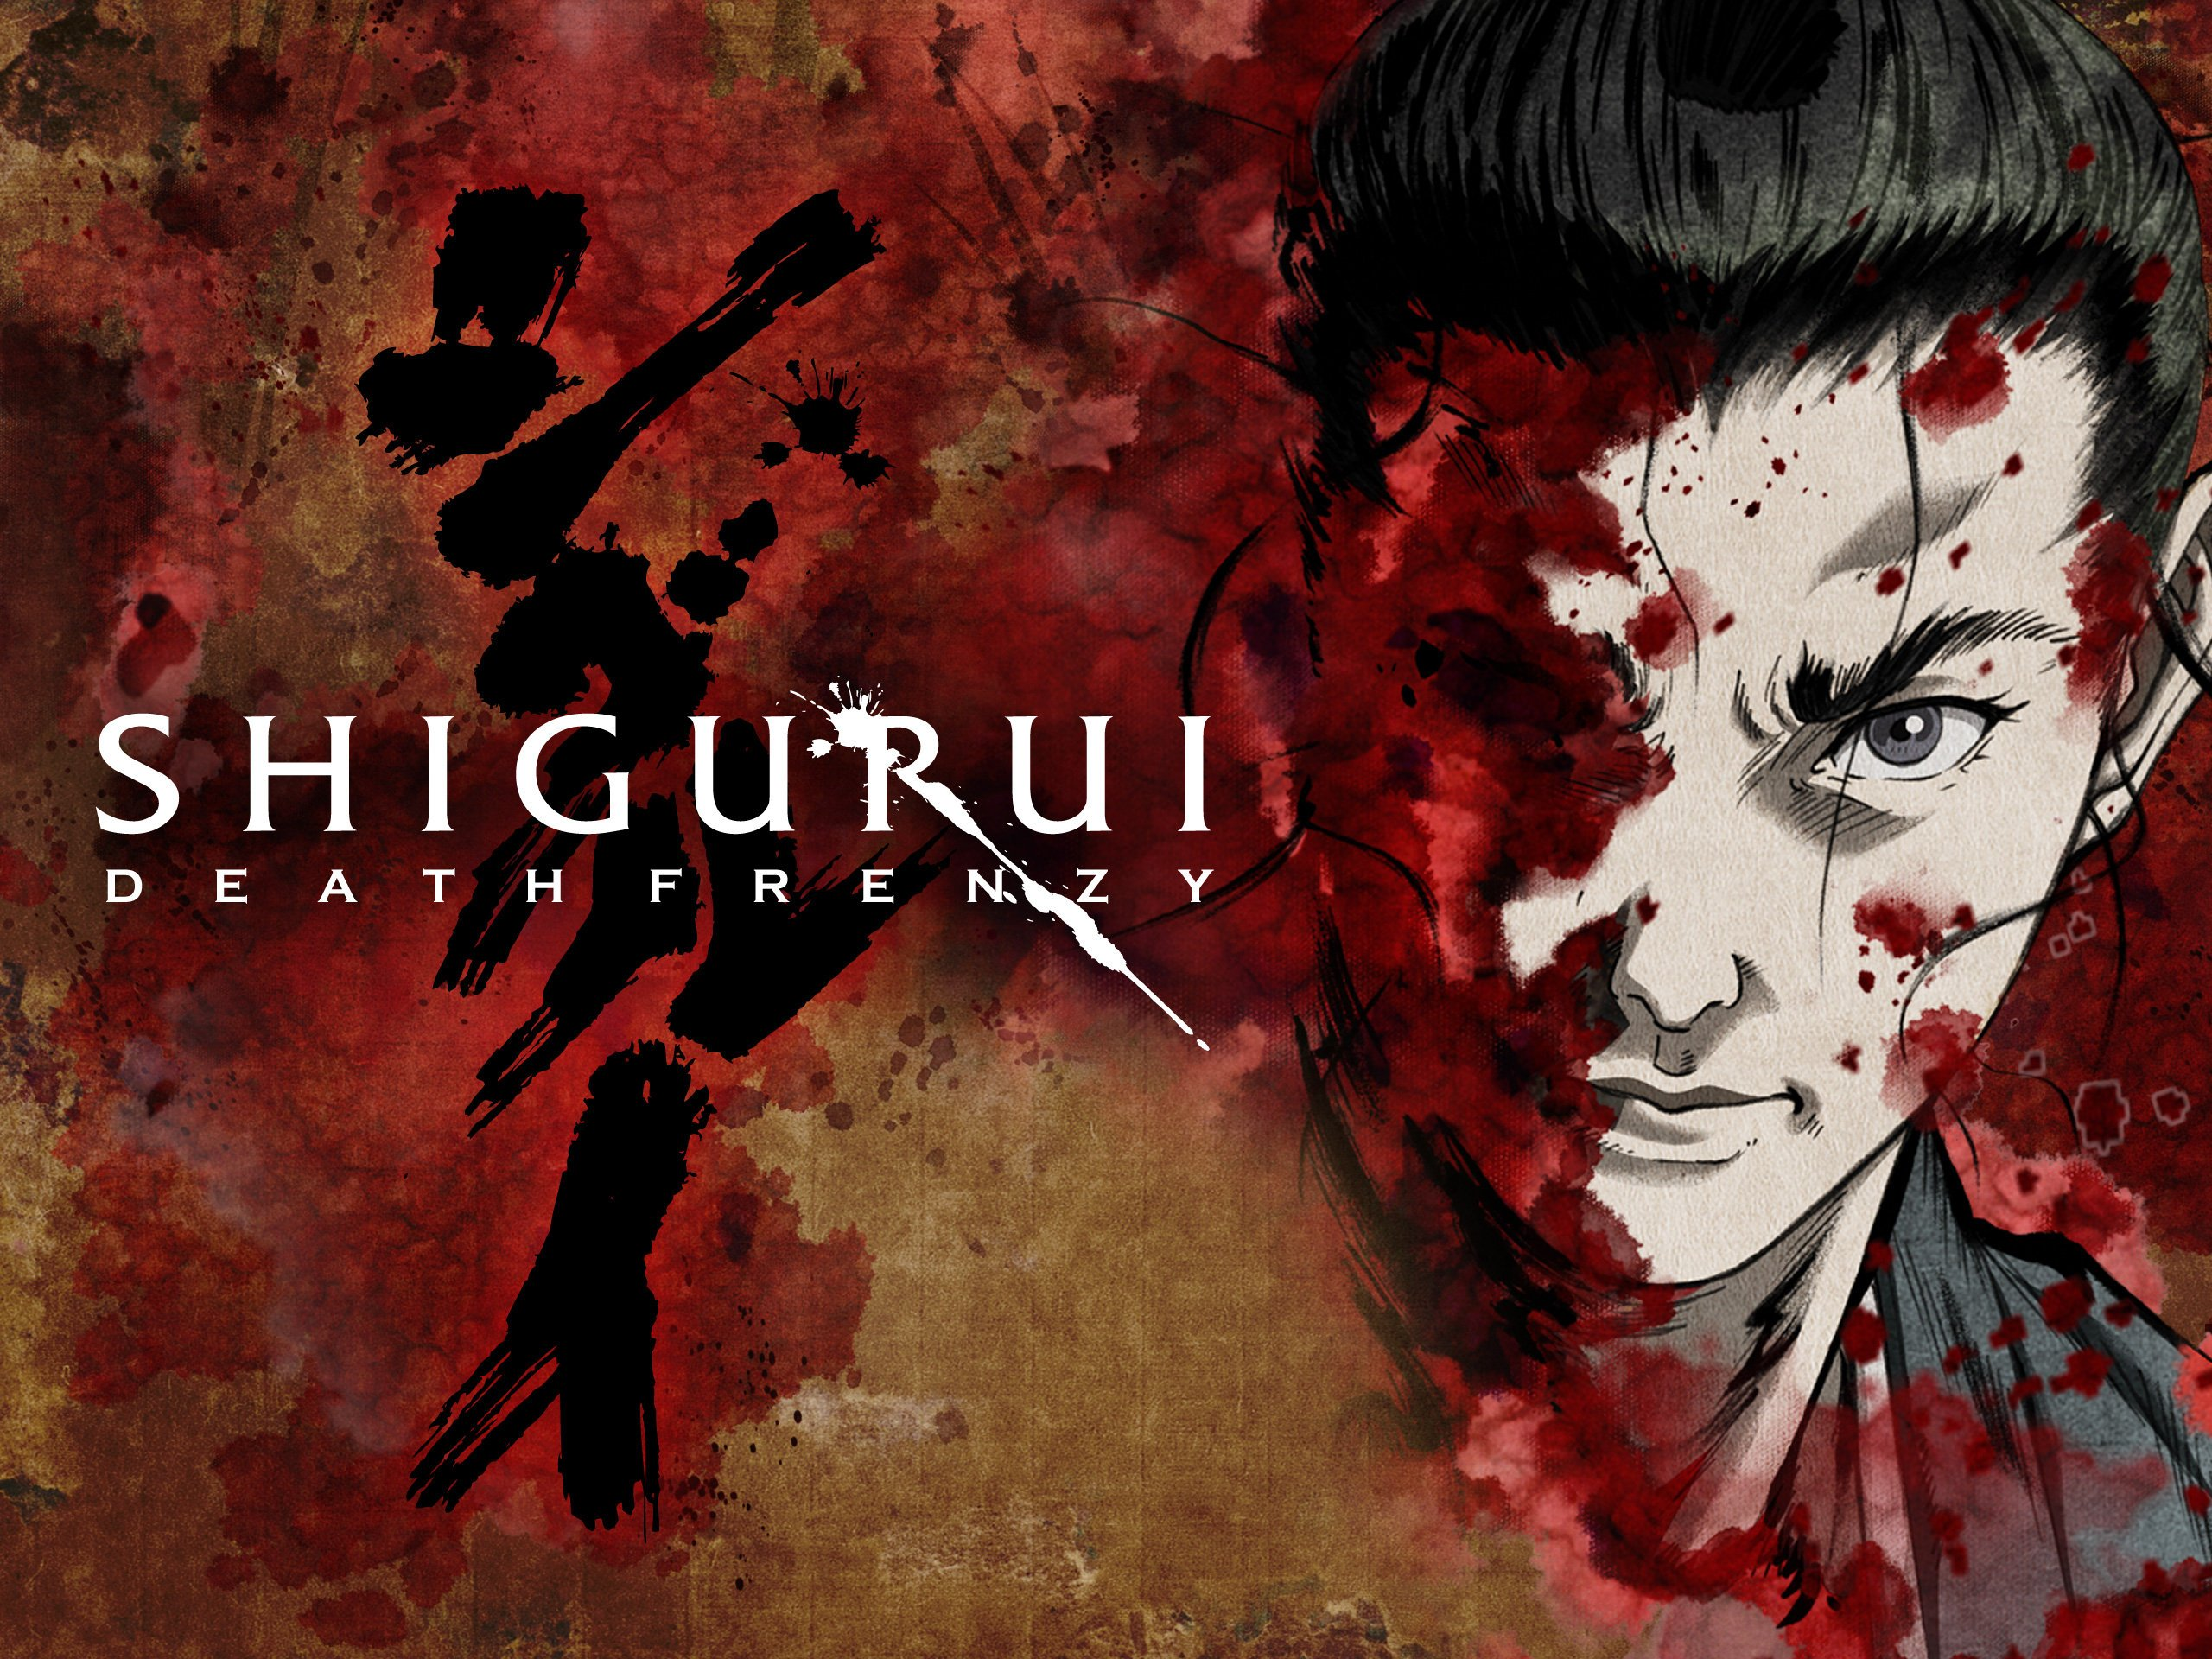 Amazon.com: Shigurui: Death Frenzy